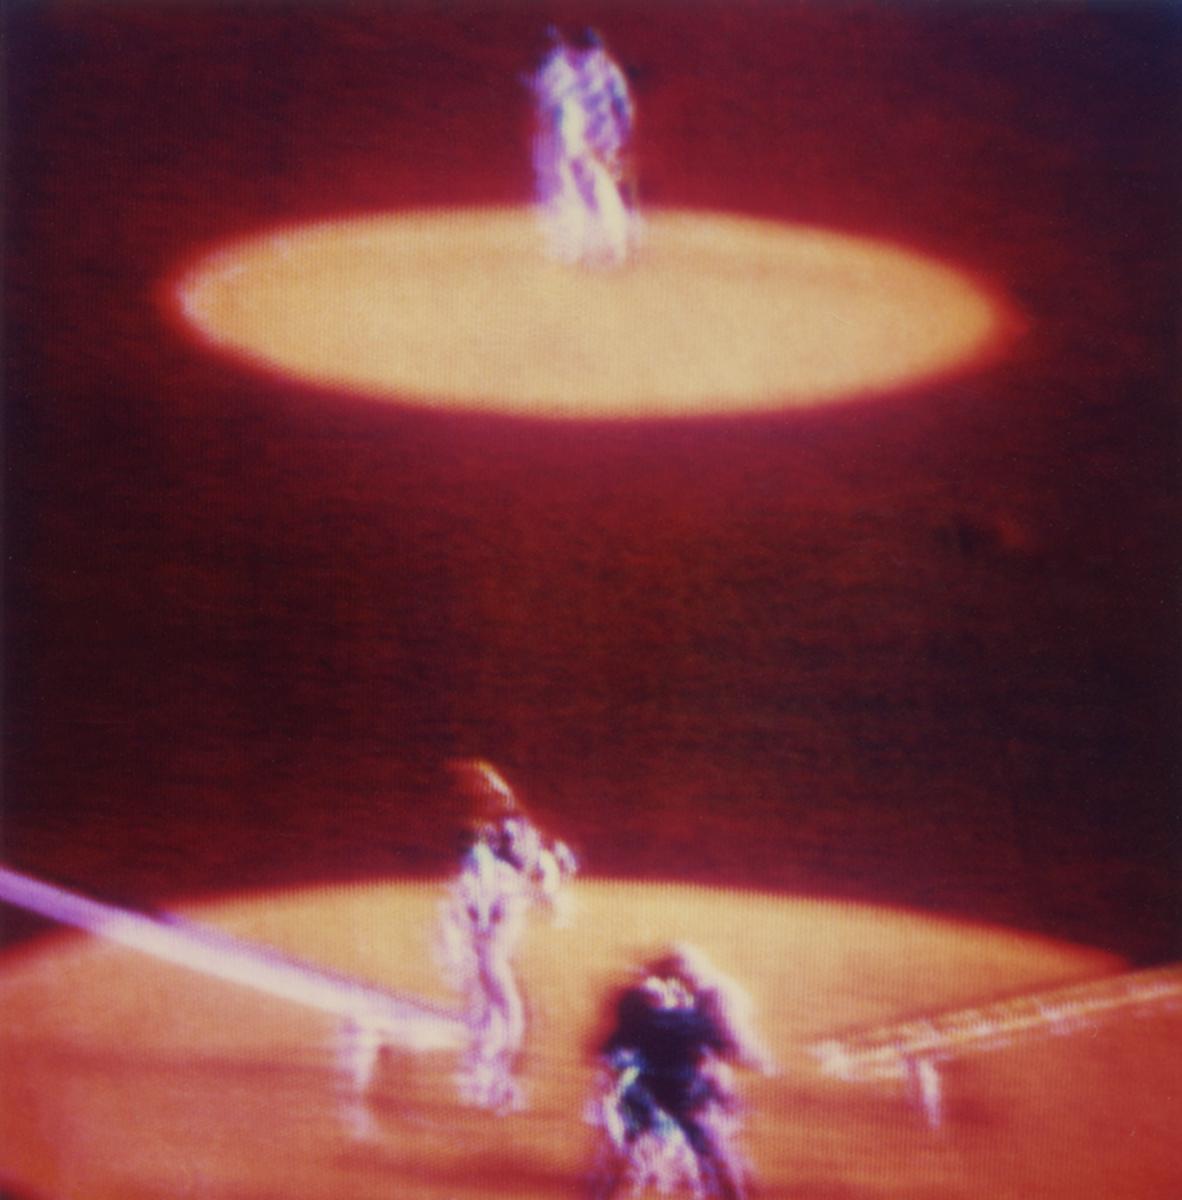 Television-TV-Polaroid-SX70-Baseball.jpg